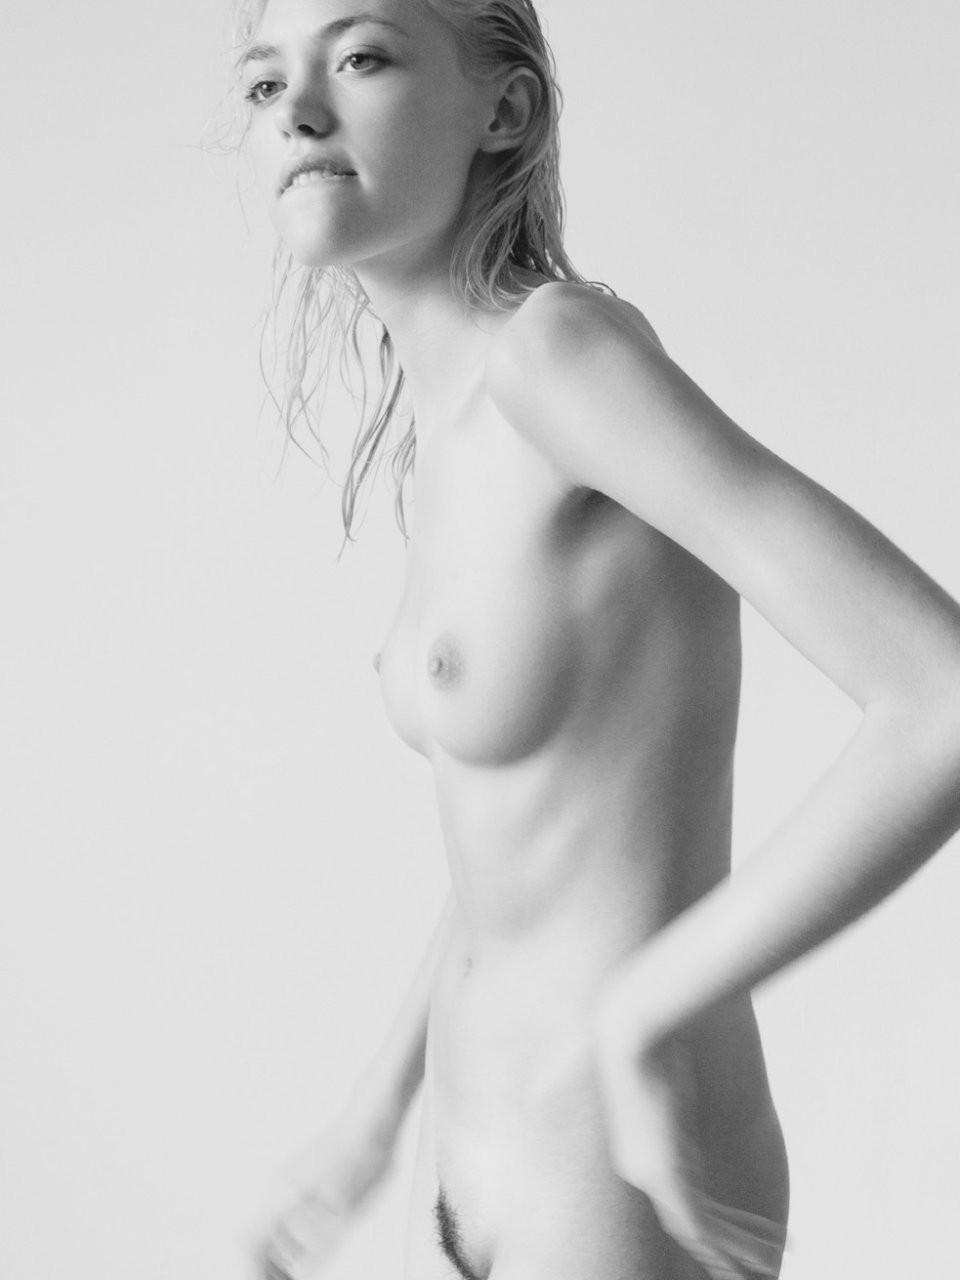 Cora Keegan Naked 29 TheFappening.nu